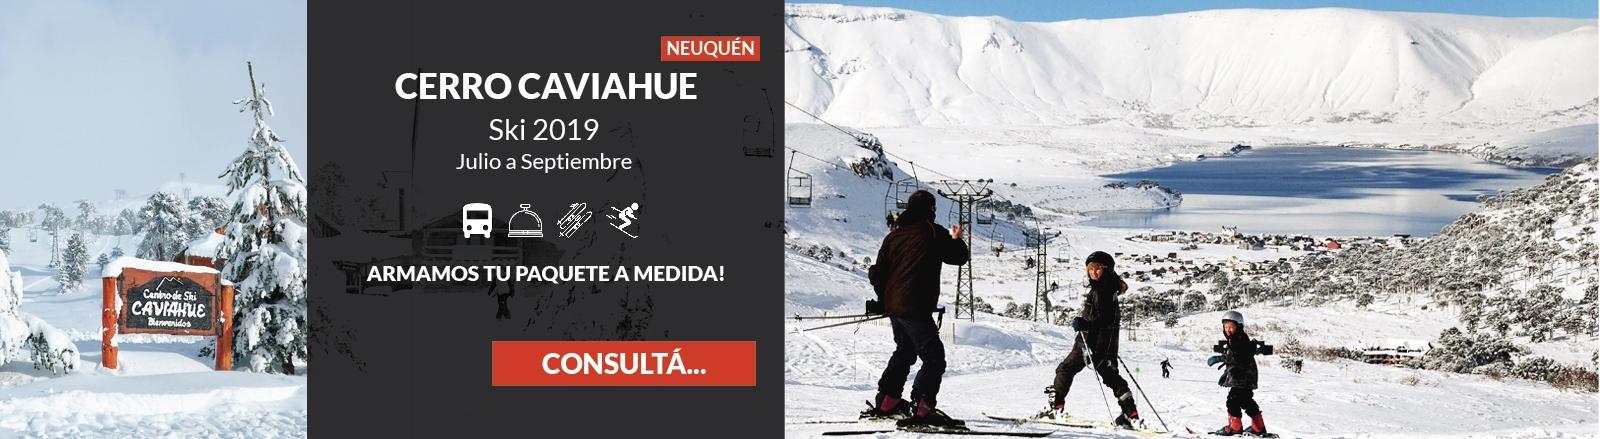 Ski Caviahue